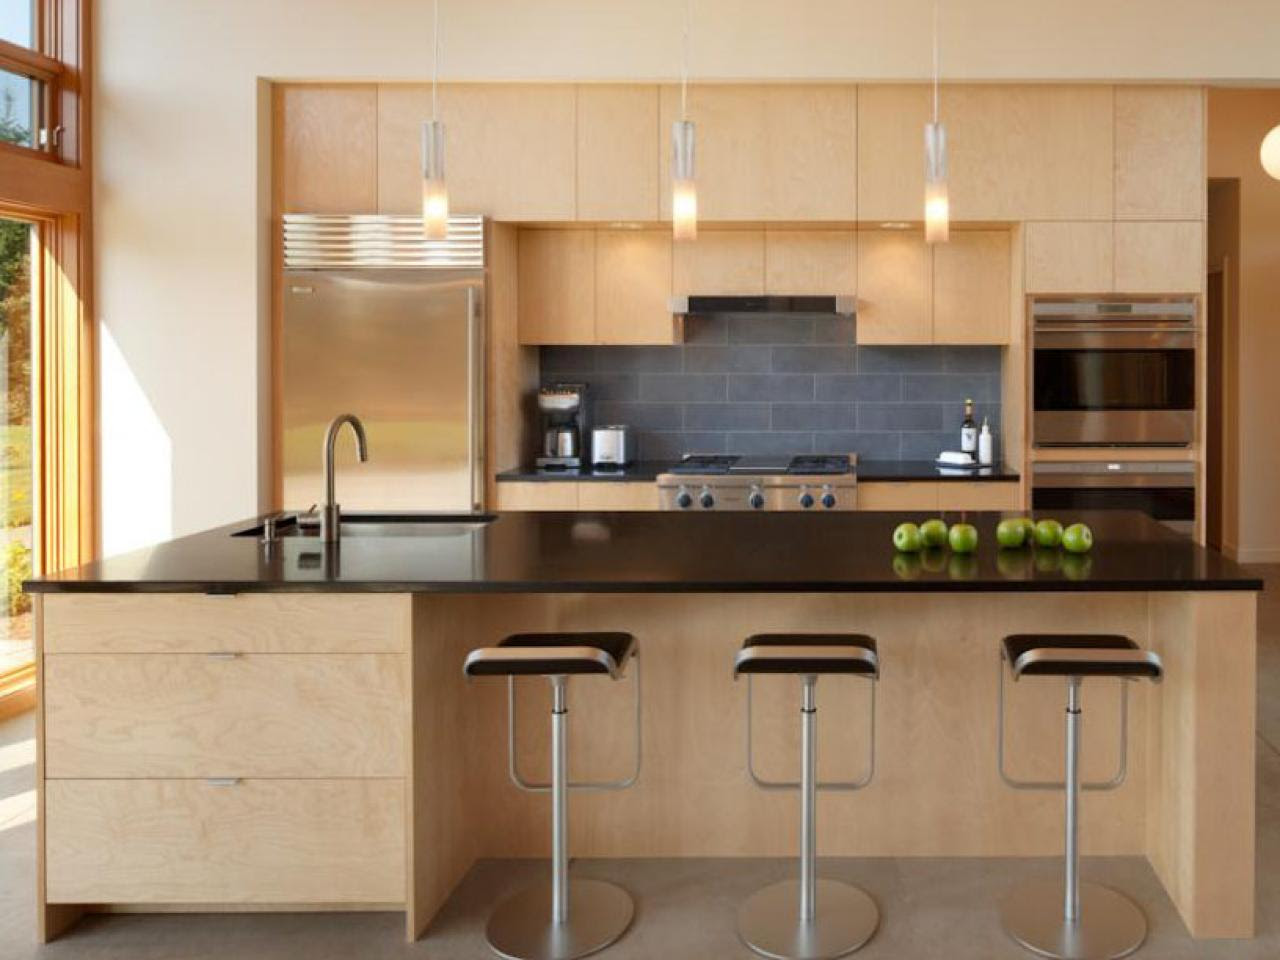 Image Result For X Kitchen Design Ideas